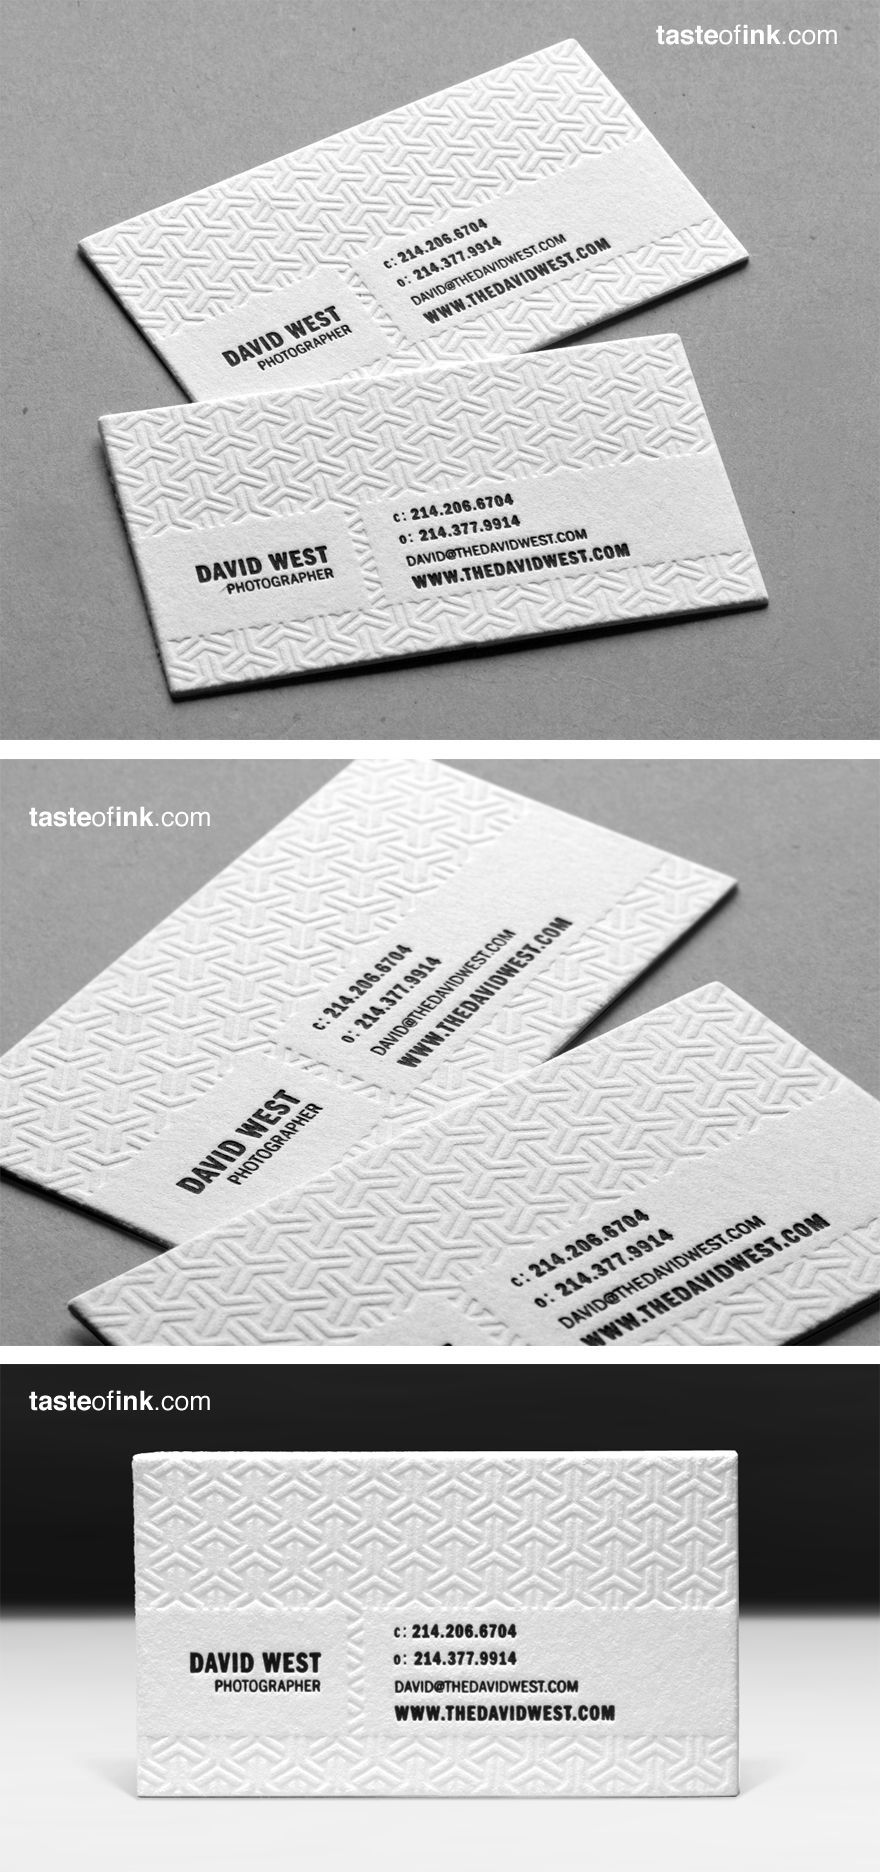 Blind Impression Name Card Design Photography Business Cards